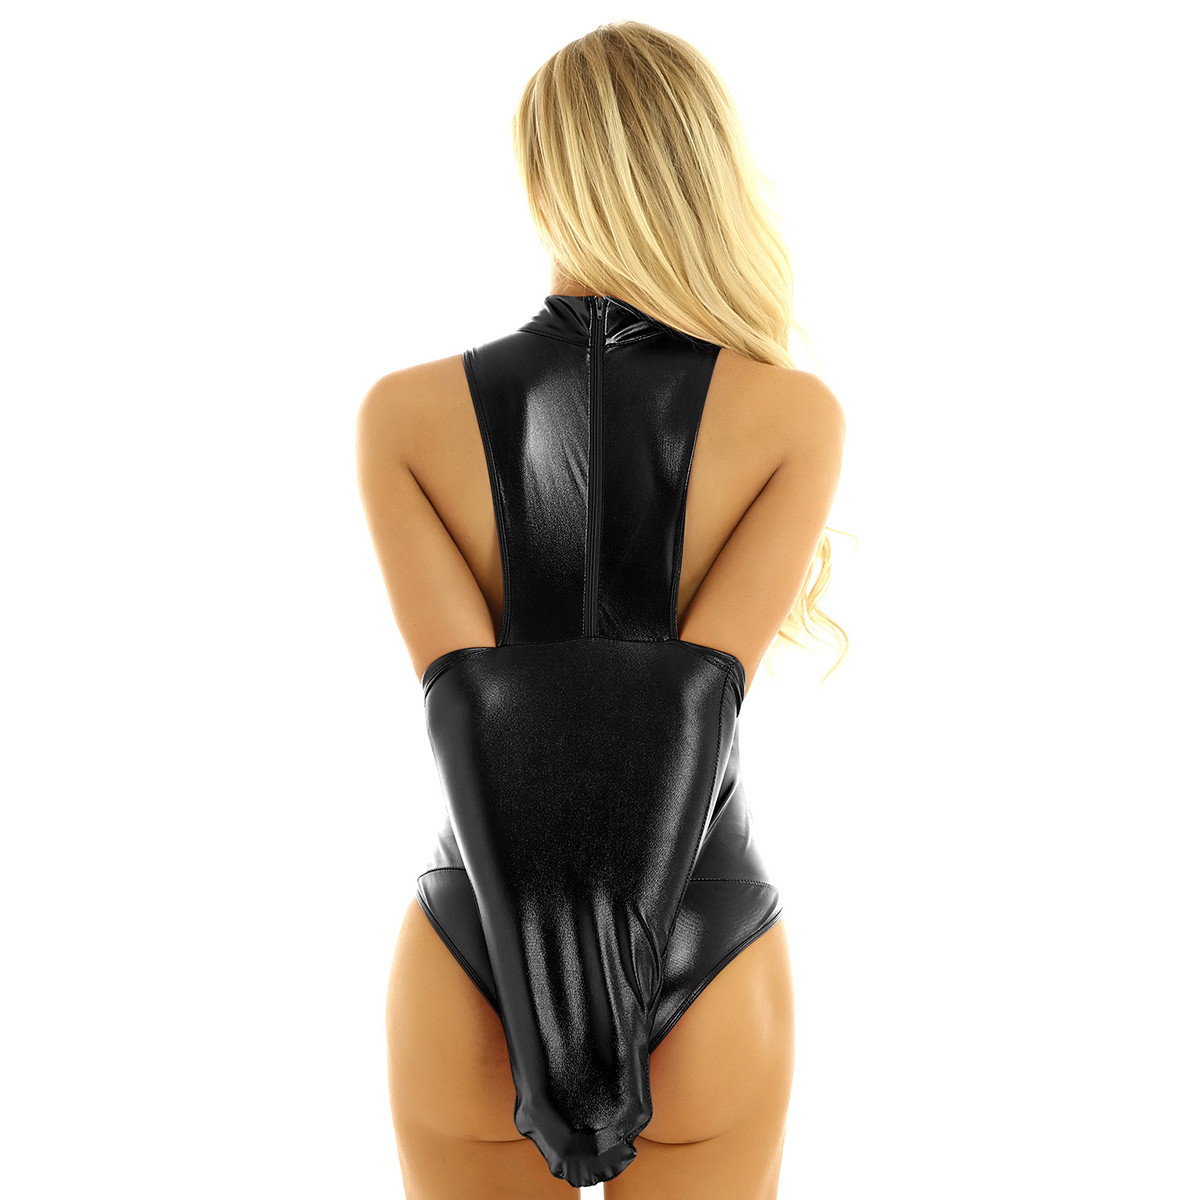 US Women/'s Shiny Metallic Bodysuit Lingerie Mock Neck Armbinder Glove Nightwear